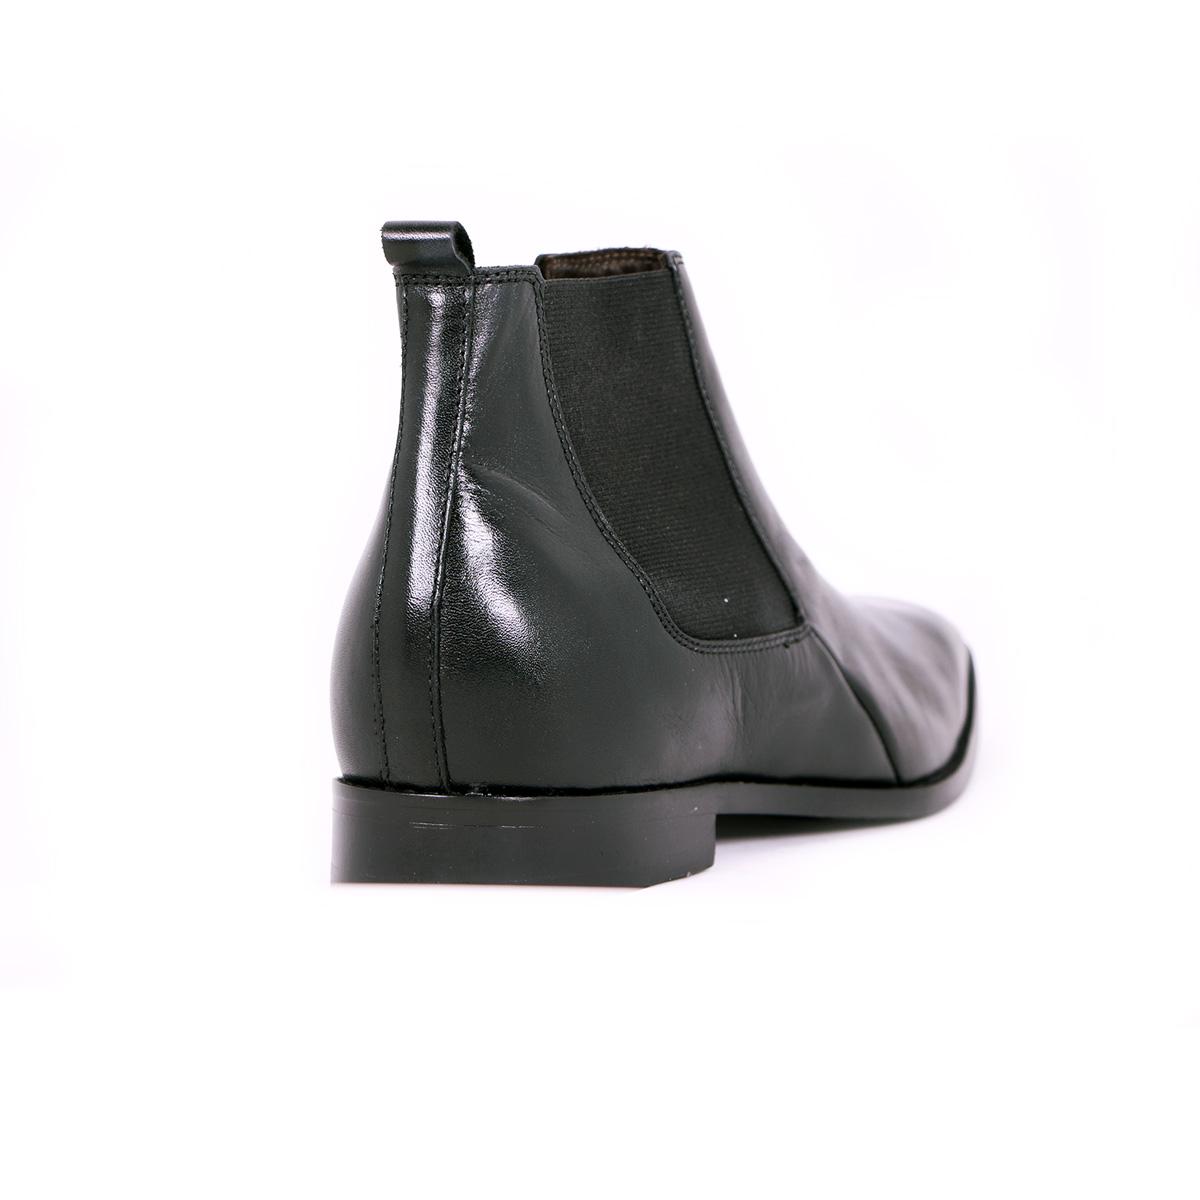 Botín Formal Lord Negro Max Denegri +7cms de Altura_73425